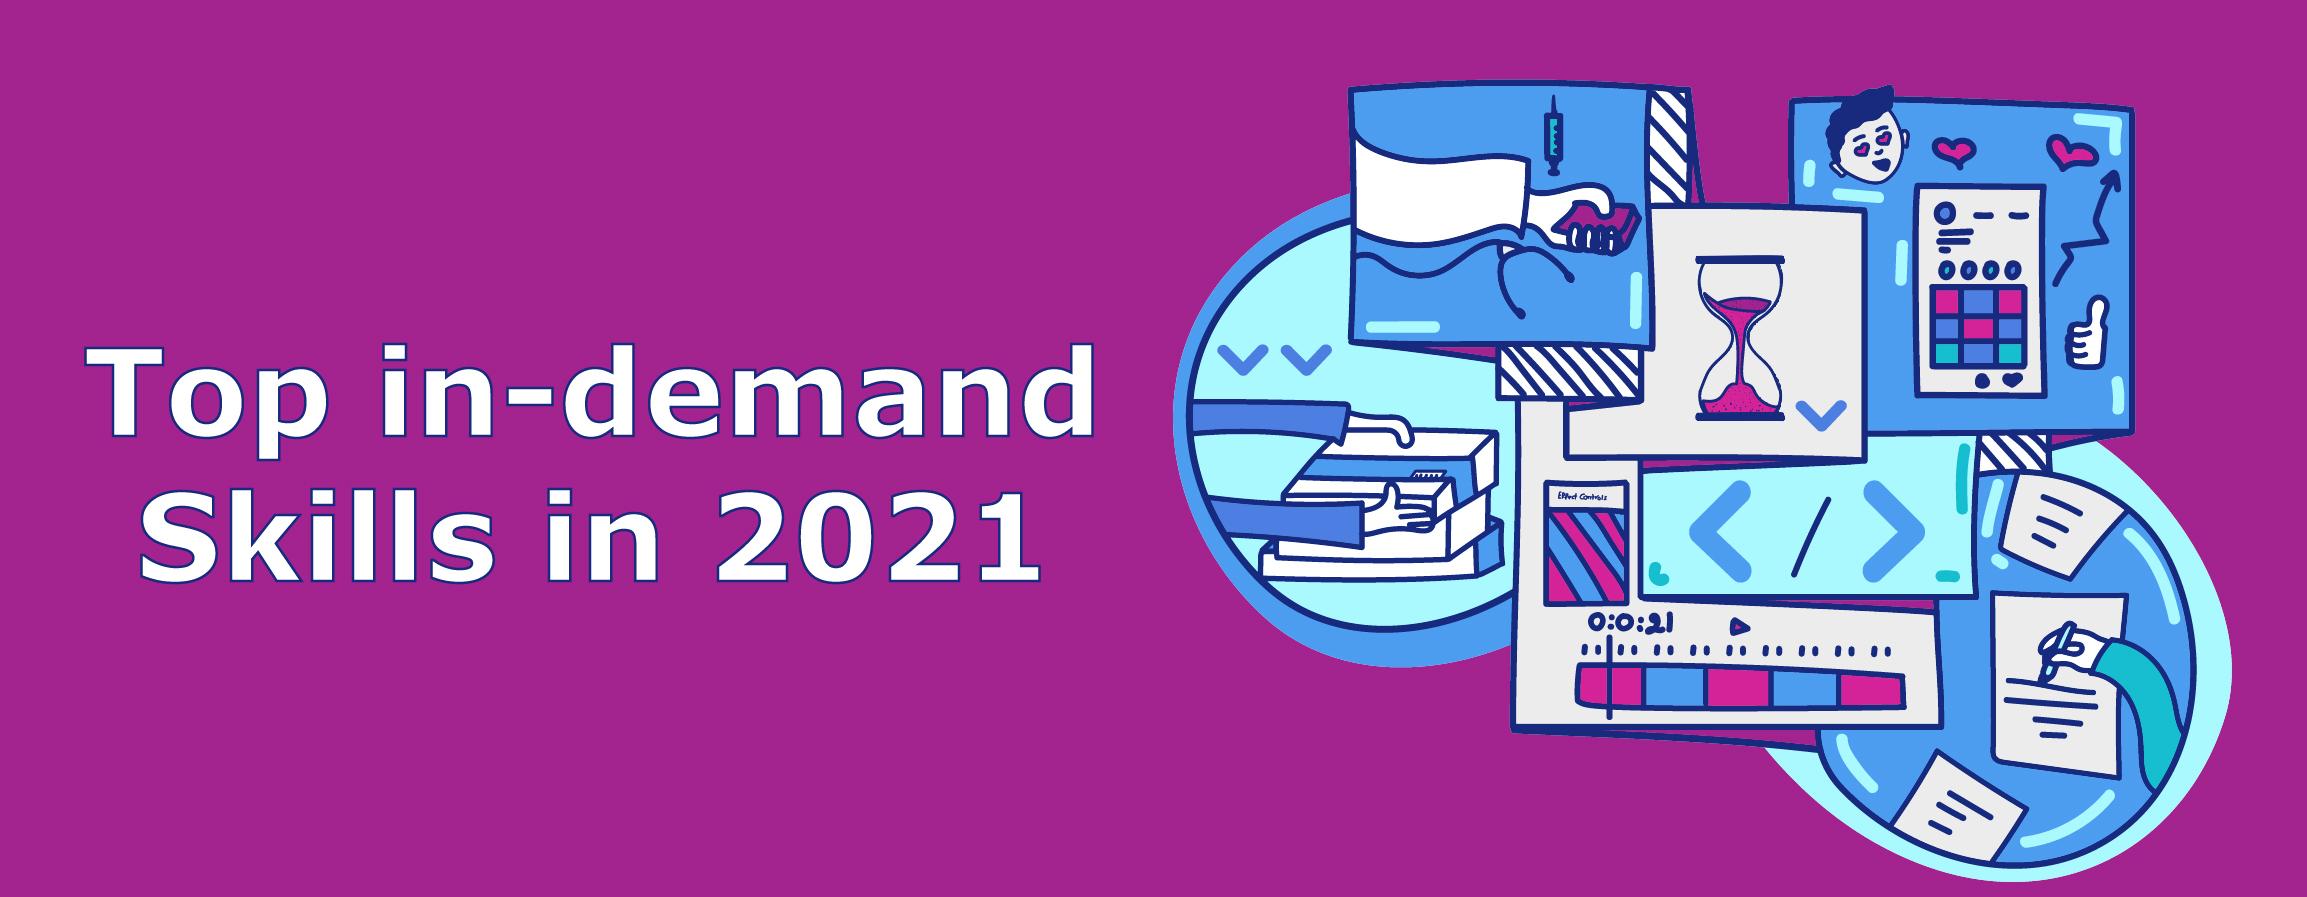 Top In-demand Skills in 2021